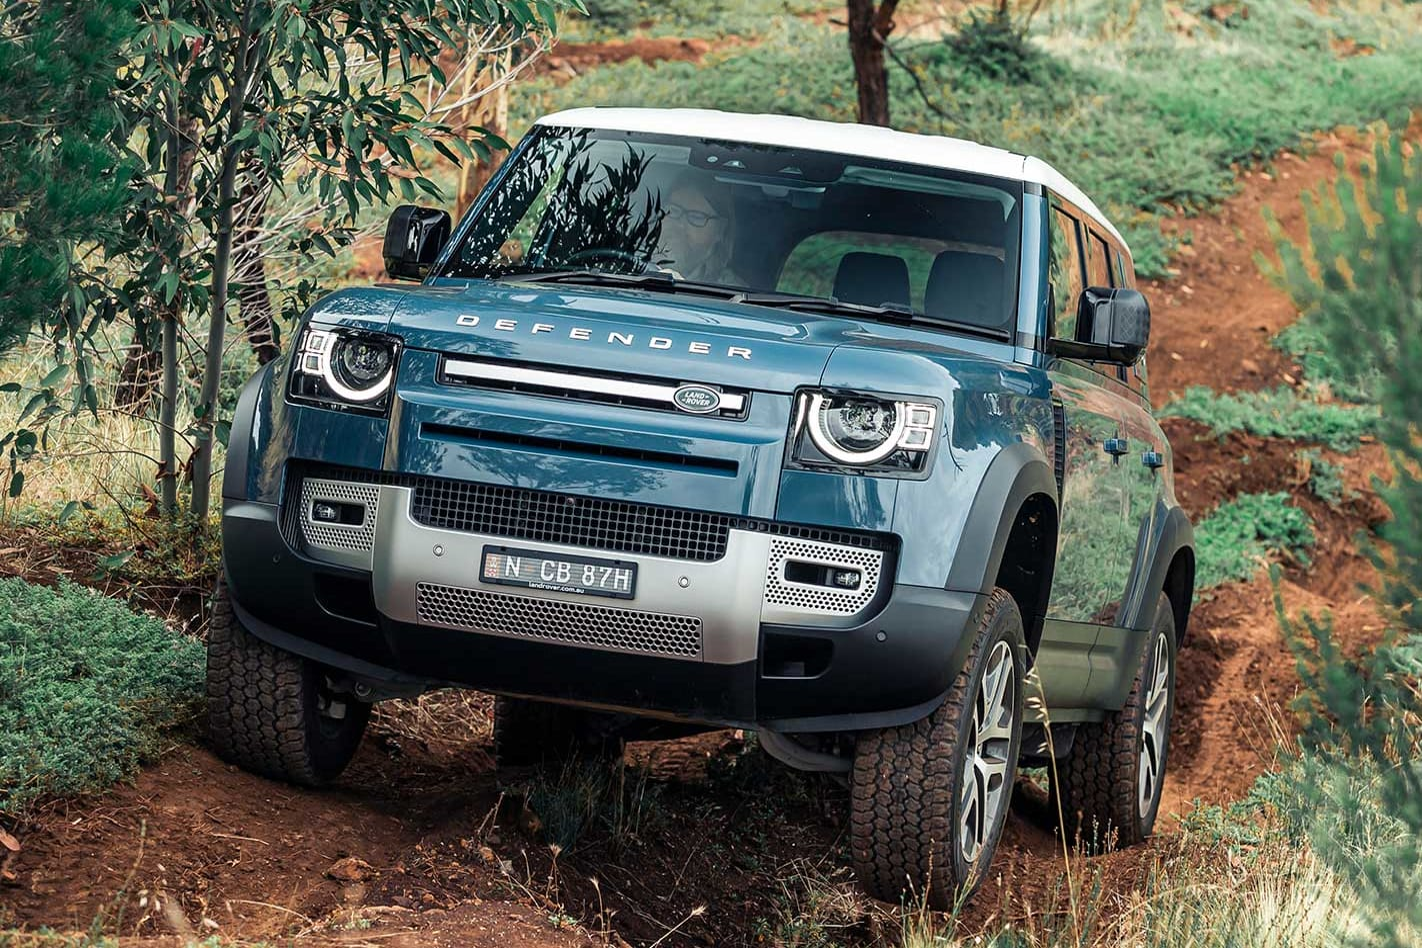 2021 Land Rover Defender 110 p400